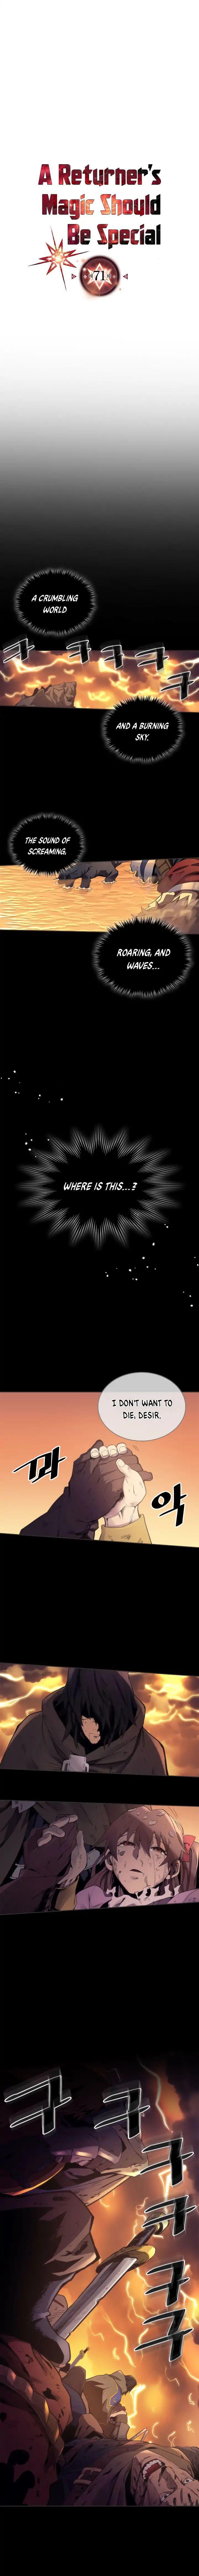 A Returner's Magic Should Be Special Chapter 71 page 2 - Mangakakalots.com